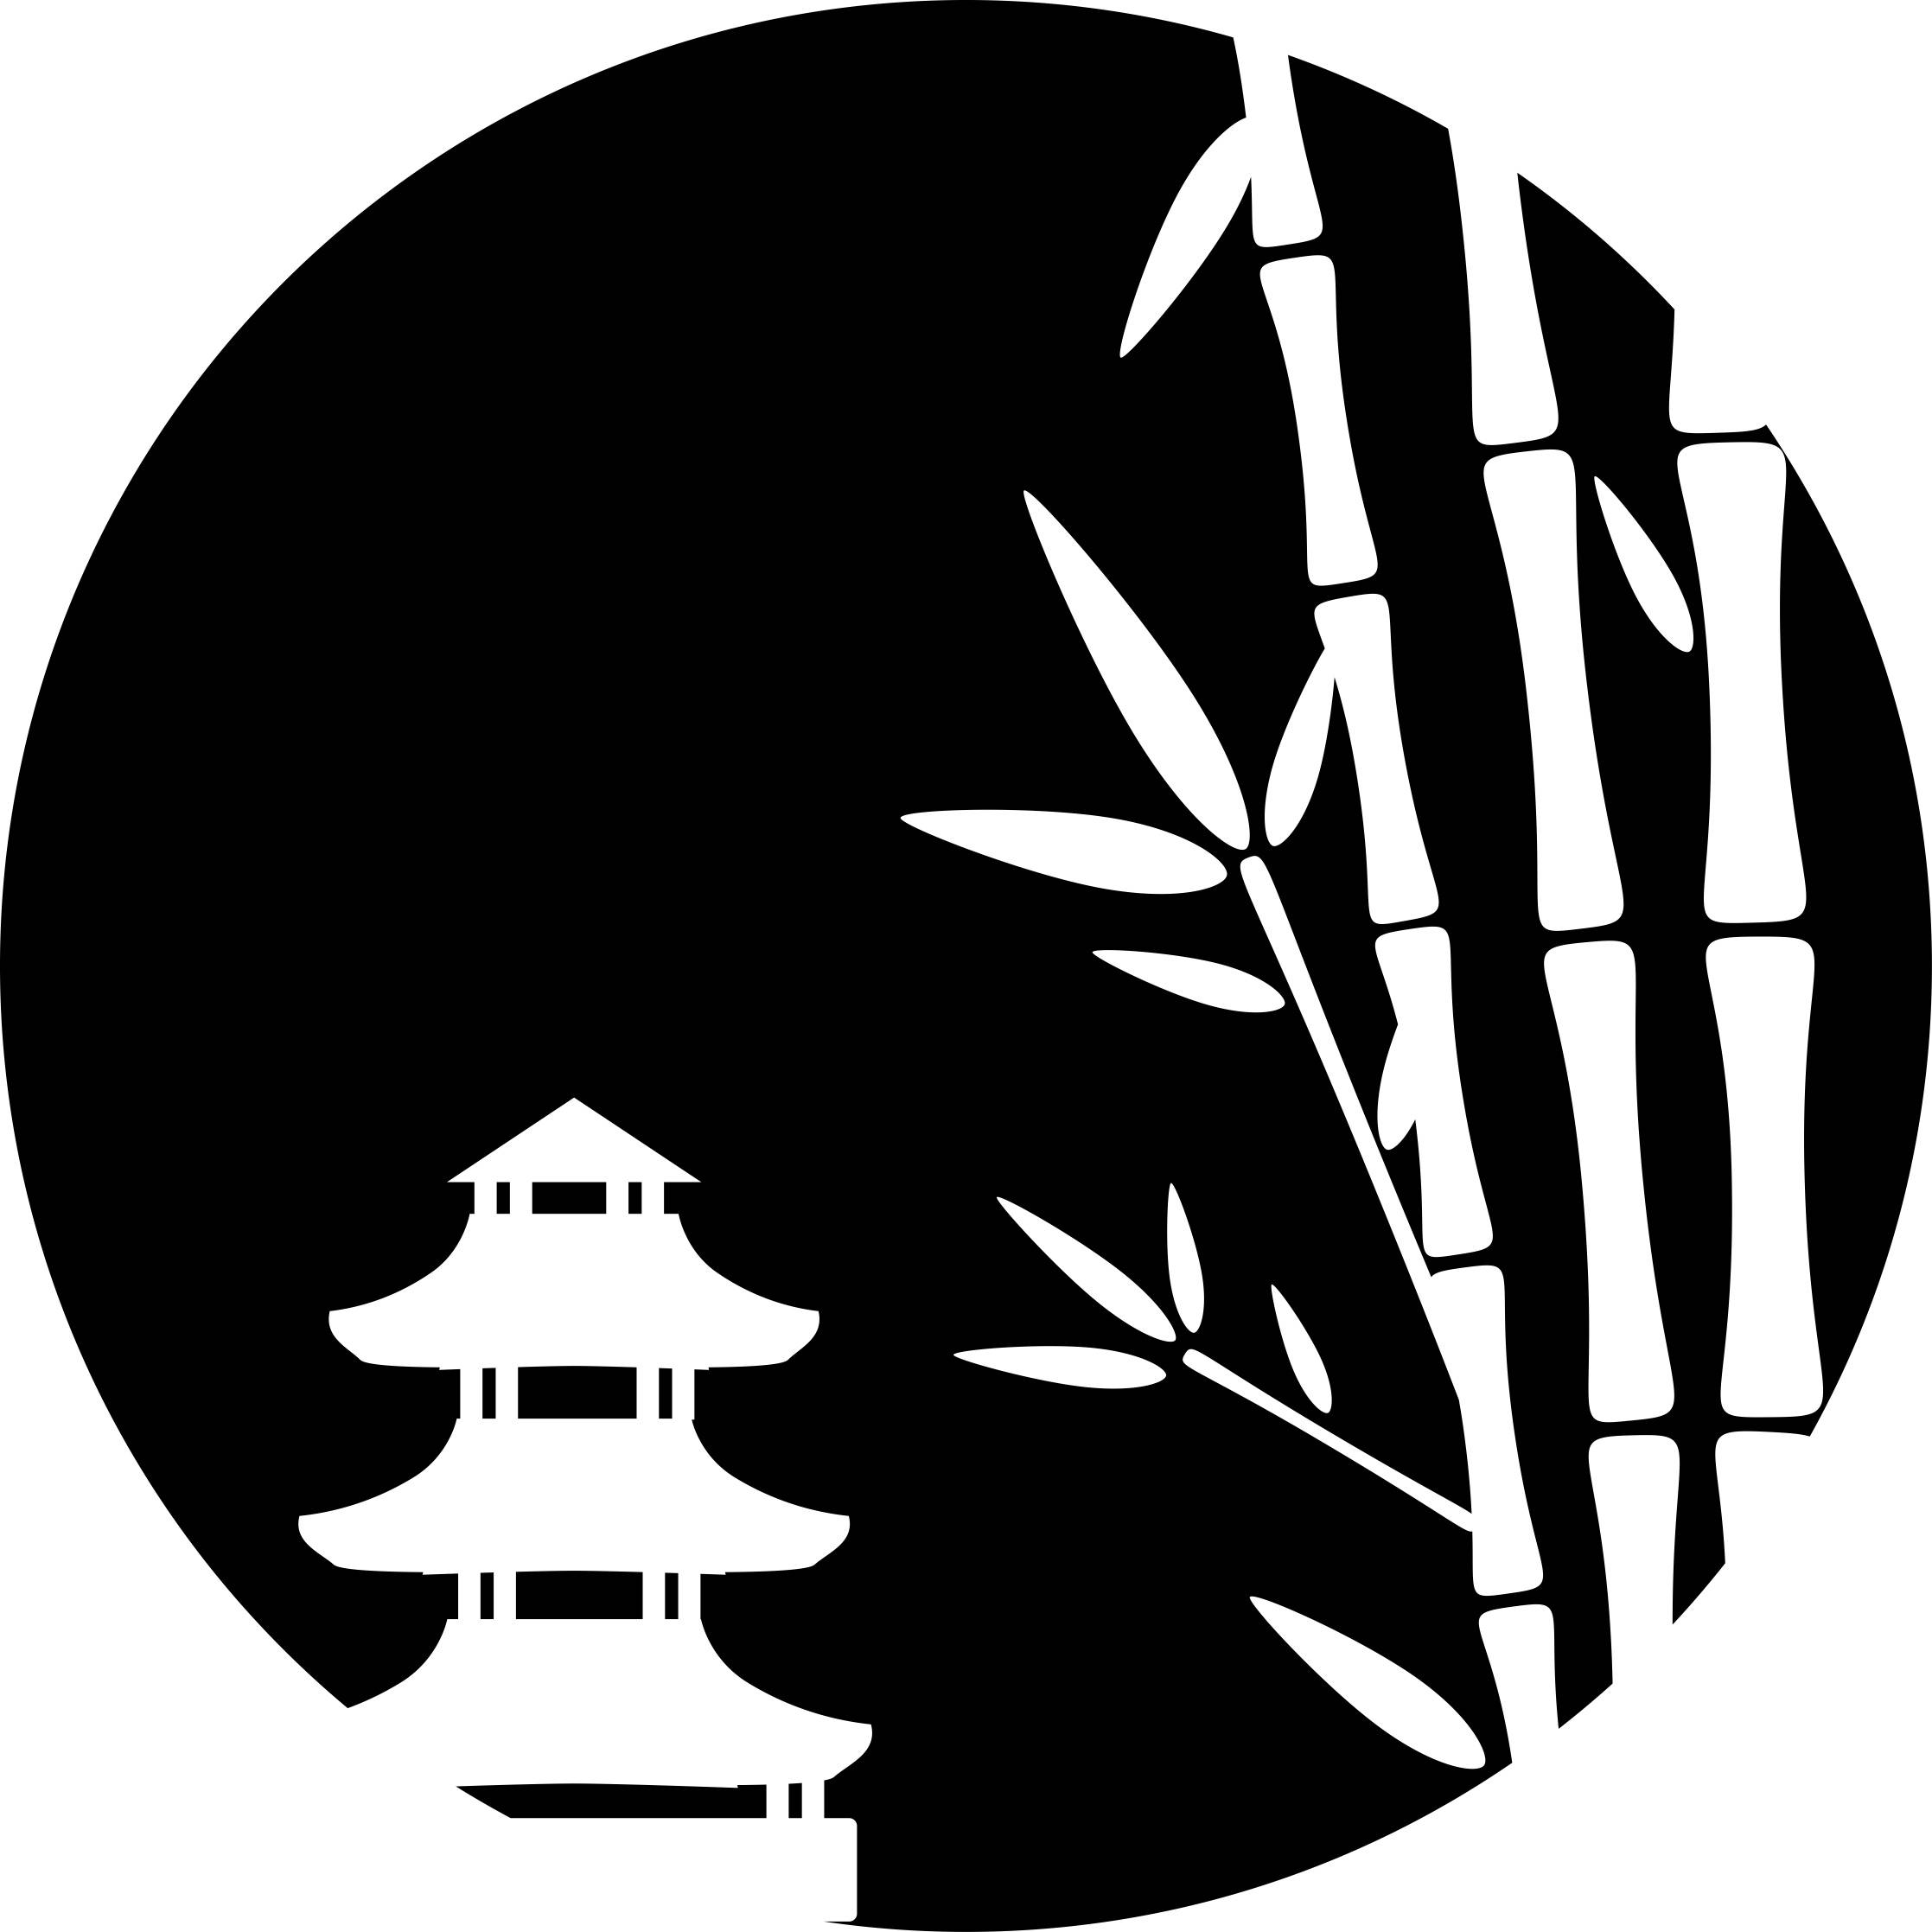 2235x2235 Japanese Origins Decal Sticker, Nippon Style, Inspiring Vinyl